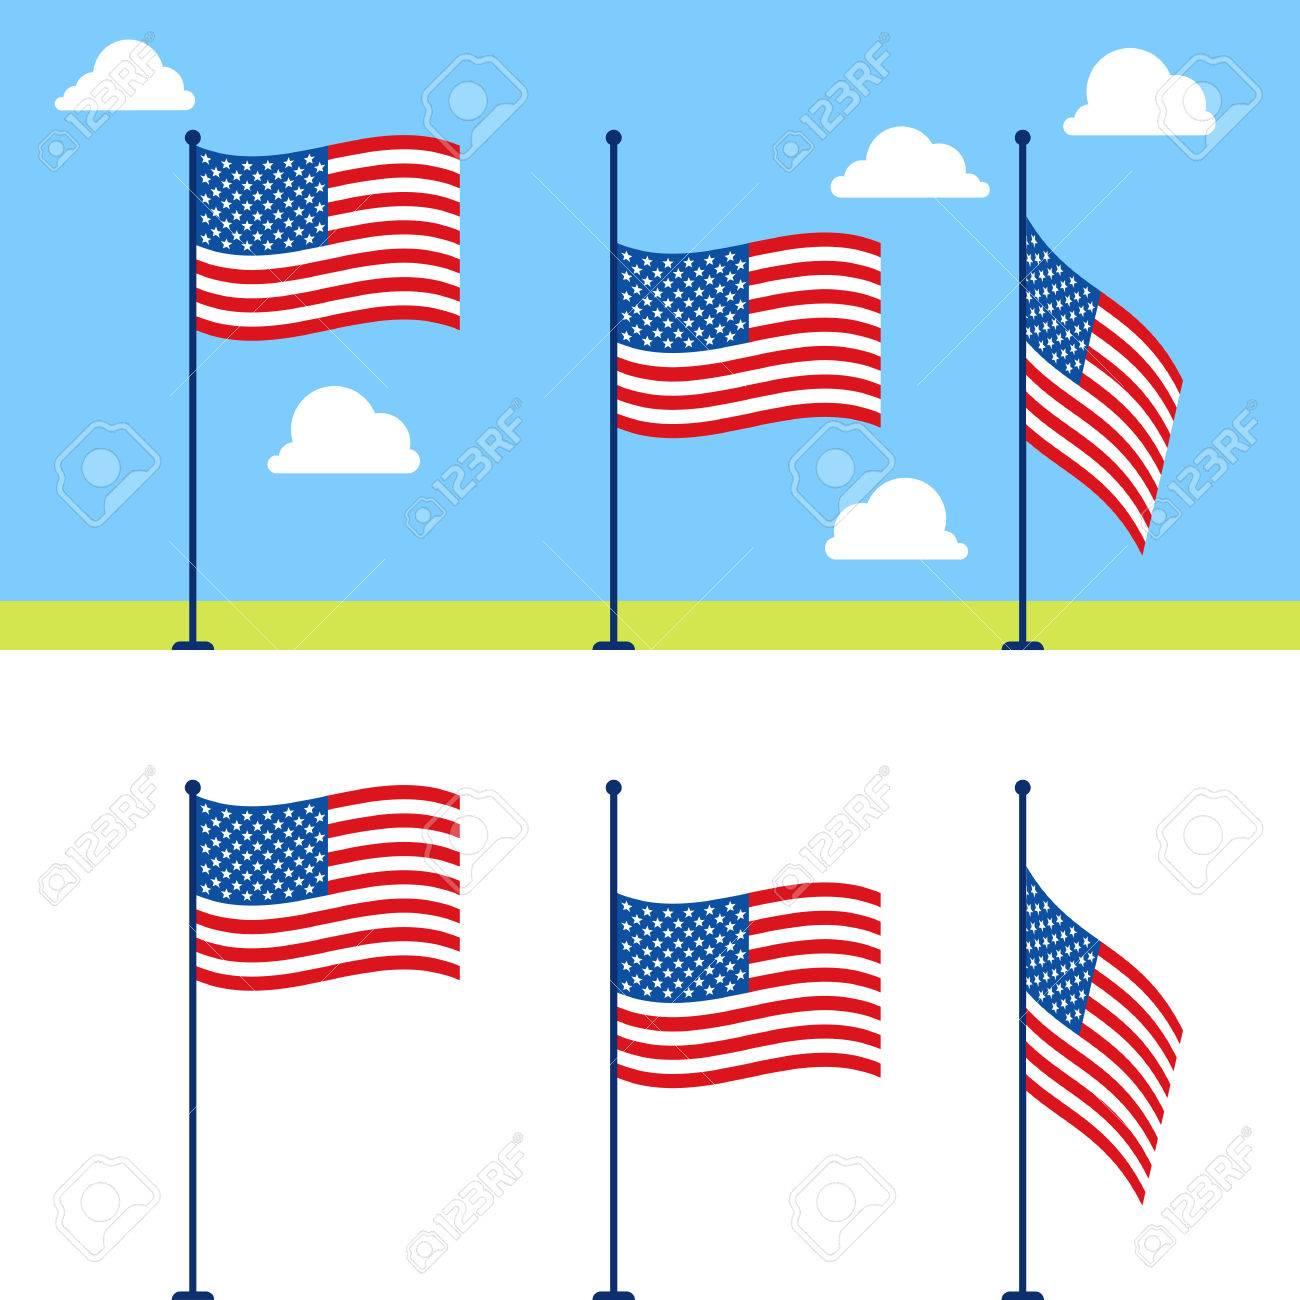 flat usa flags set united states flag color illustration on rh 123rf com US Flag Vector Clip Art US Flag Vector Clip Art